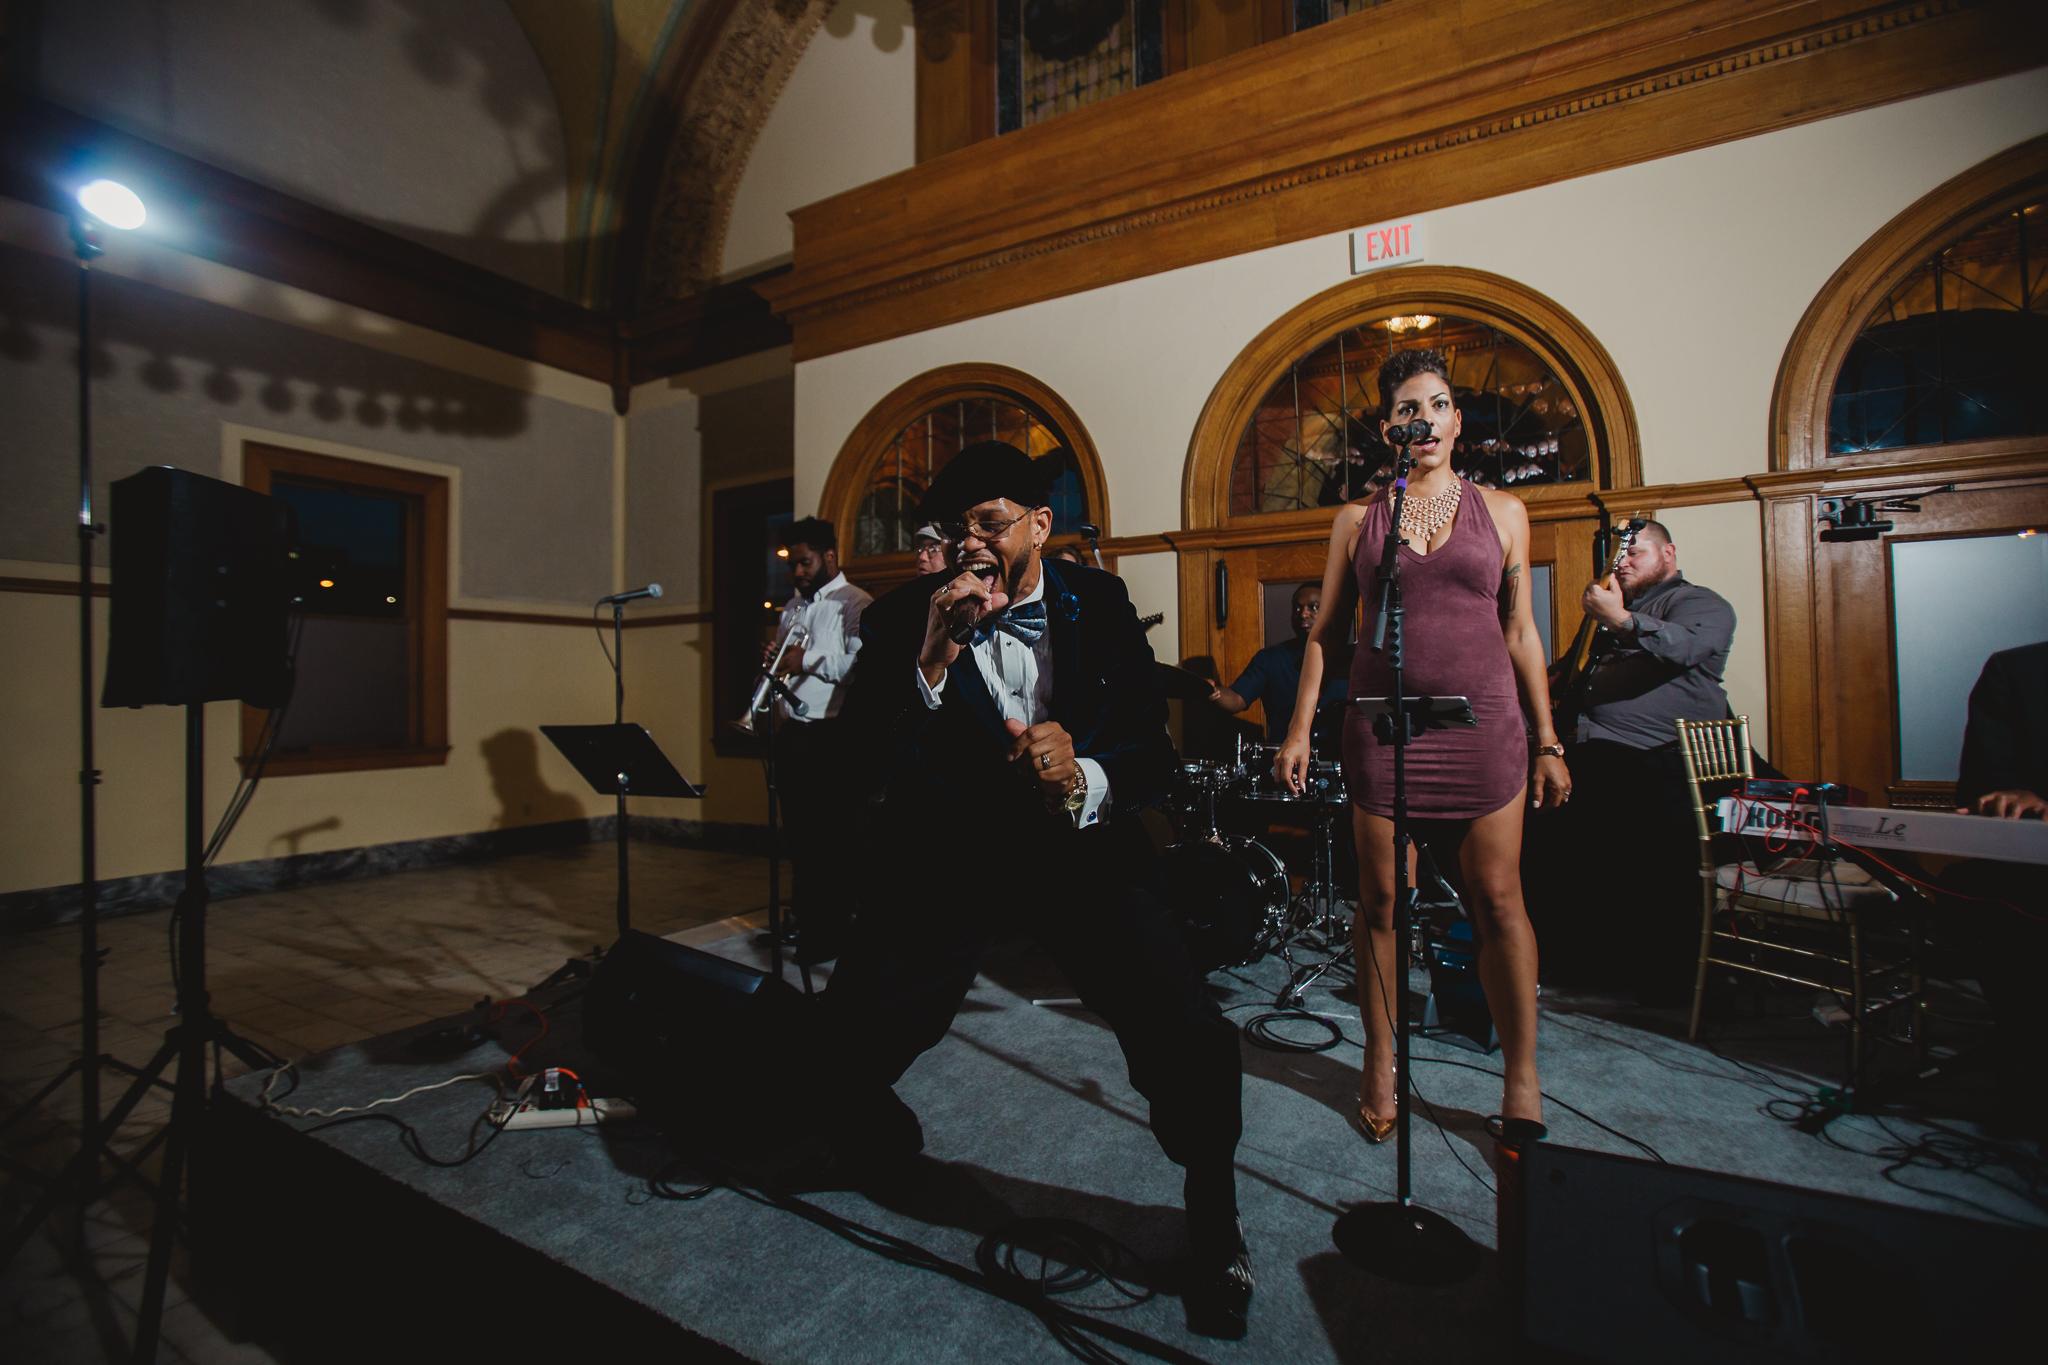 Michael and Kelly - the ashton depot - wedding DFW - wedding photographer- elizalde photography (124 of 150).jpg